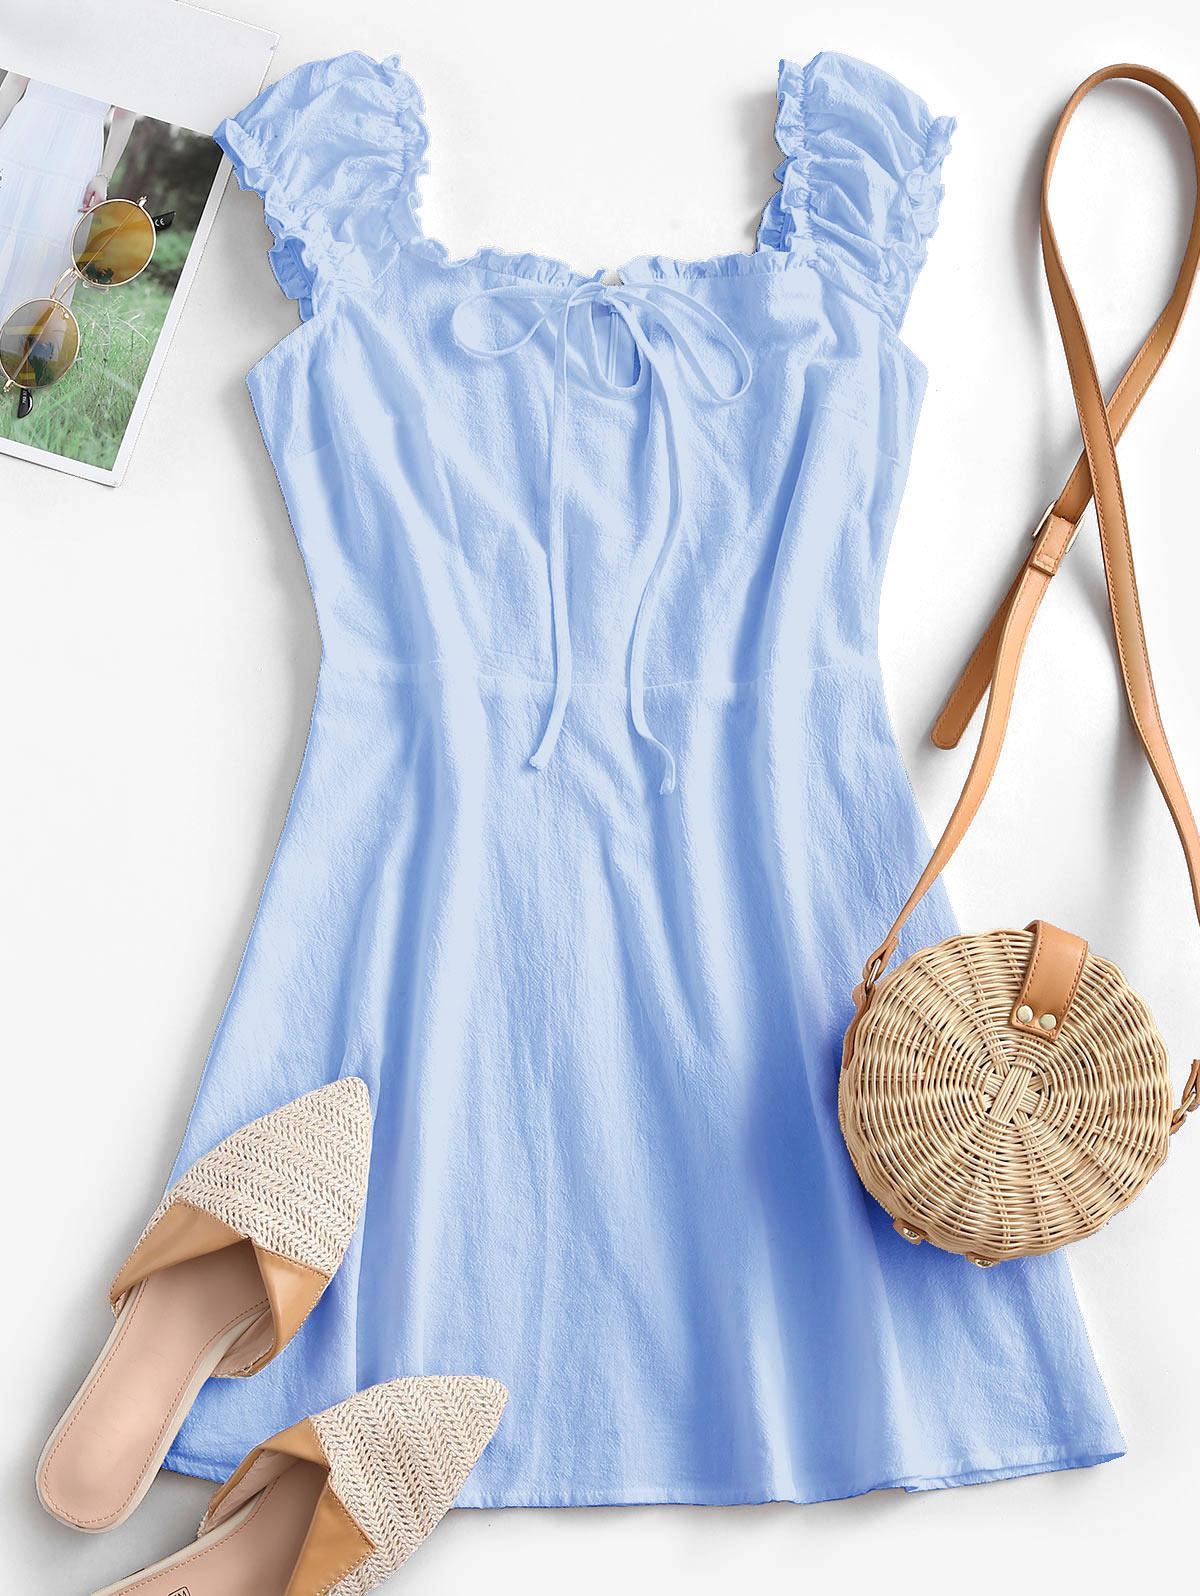 ZAFUL Frilled Tie A Line Short Dress